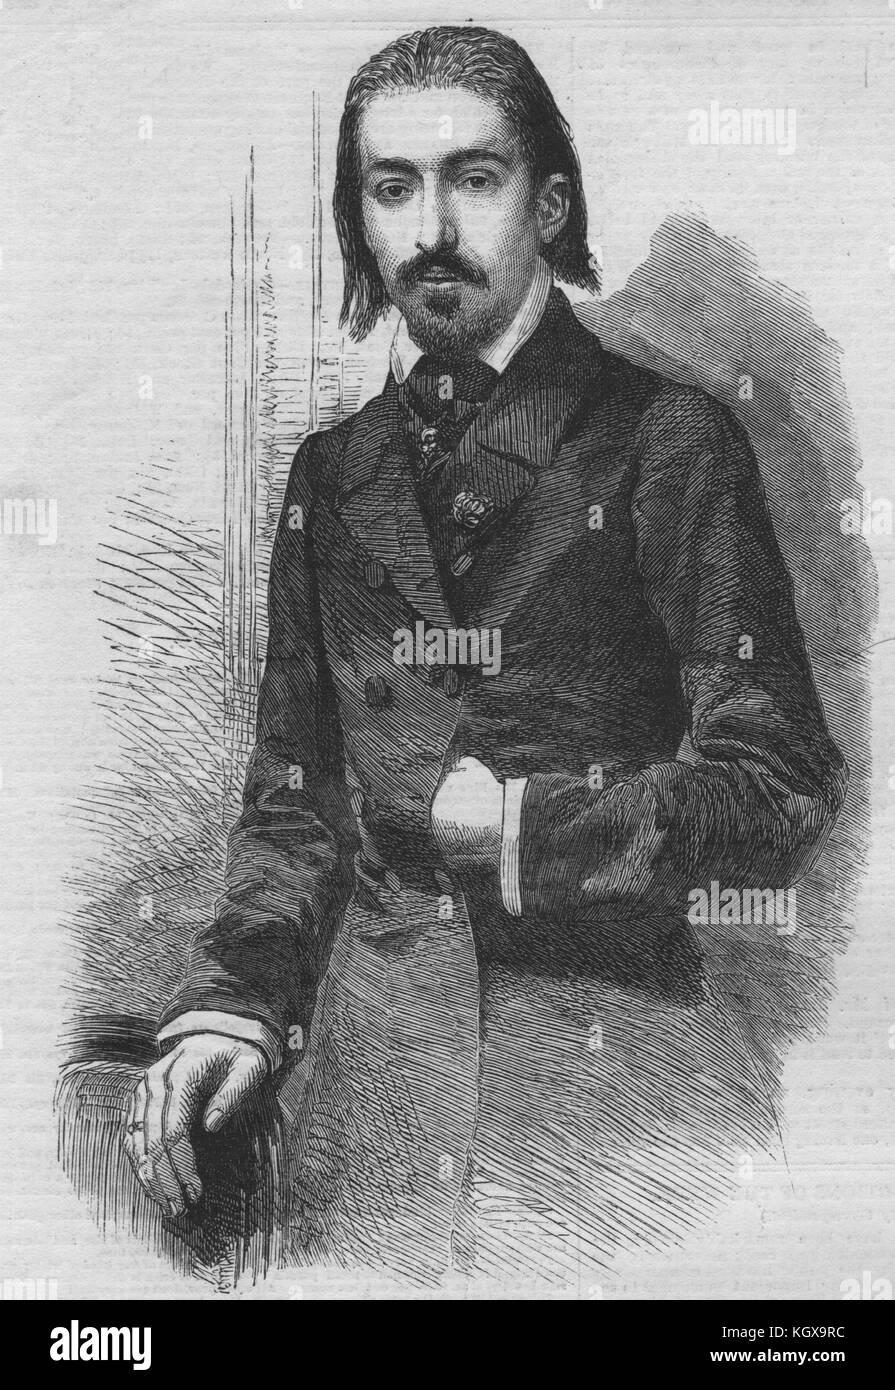 Henri Wieniawski the violinist at Jullien's concerts. Portraits 1858. The Illustrated London News - Stock Image